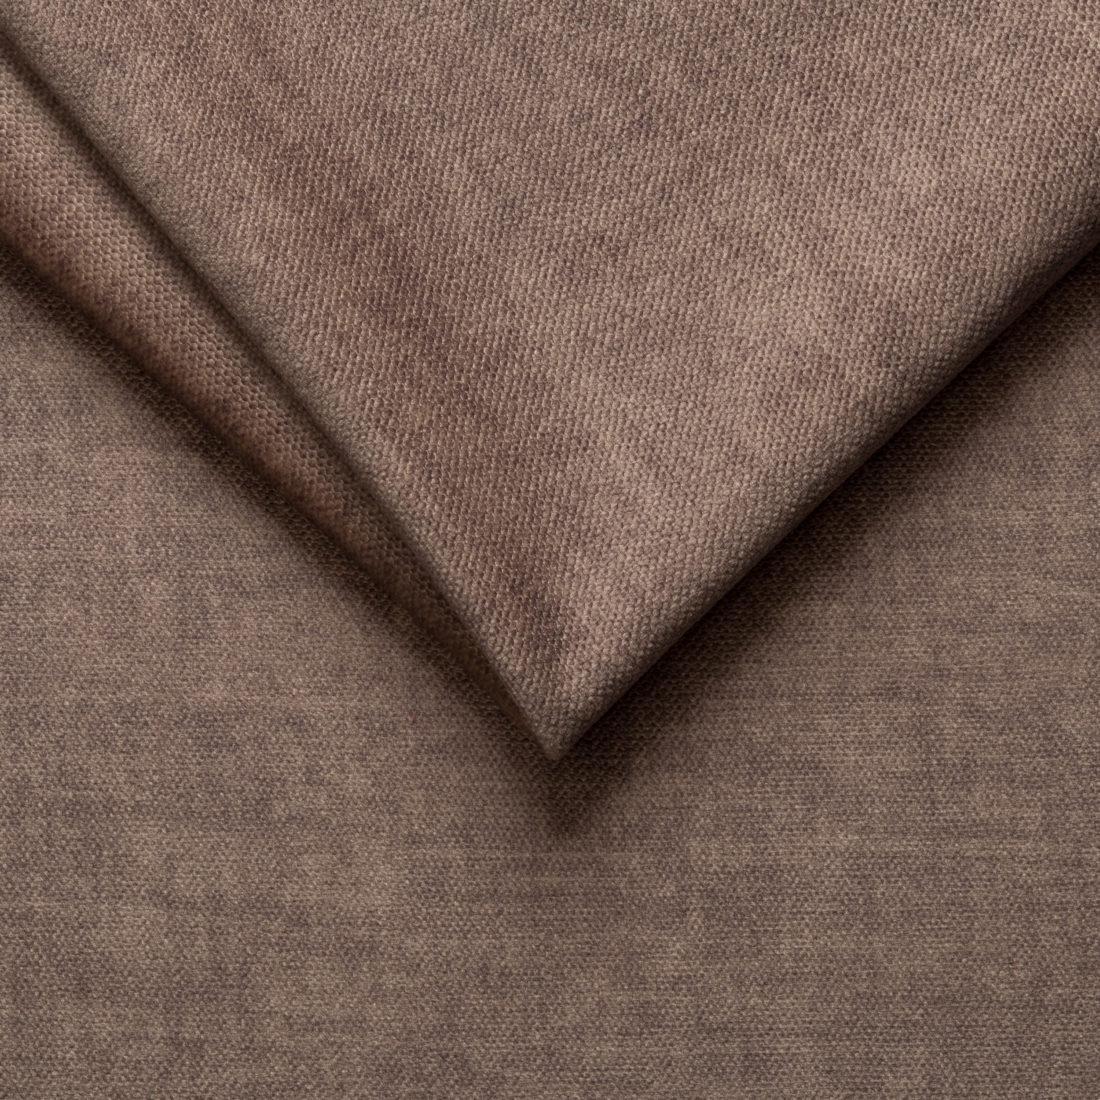 Меблева тканина Vogue 3 Antelope, велюр